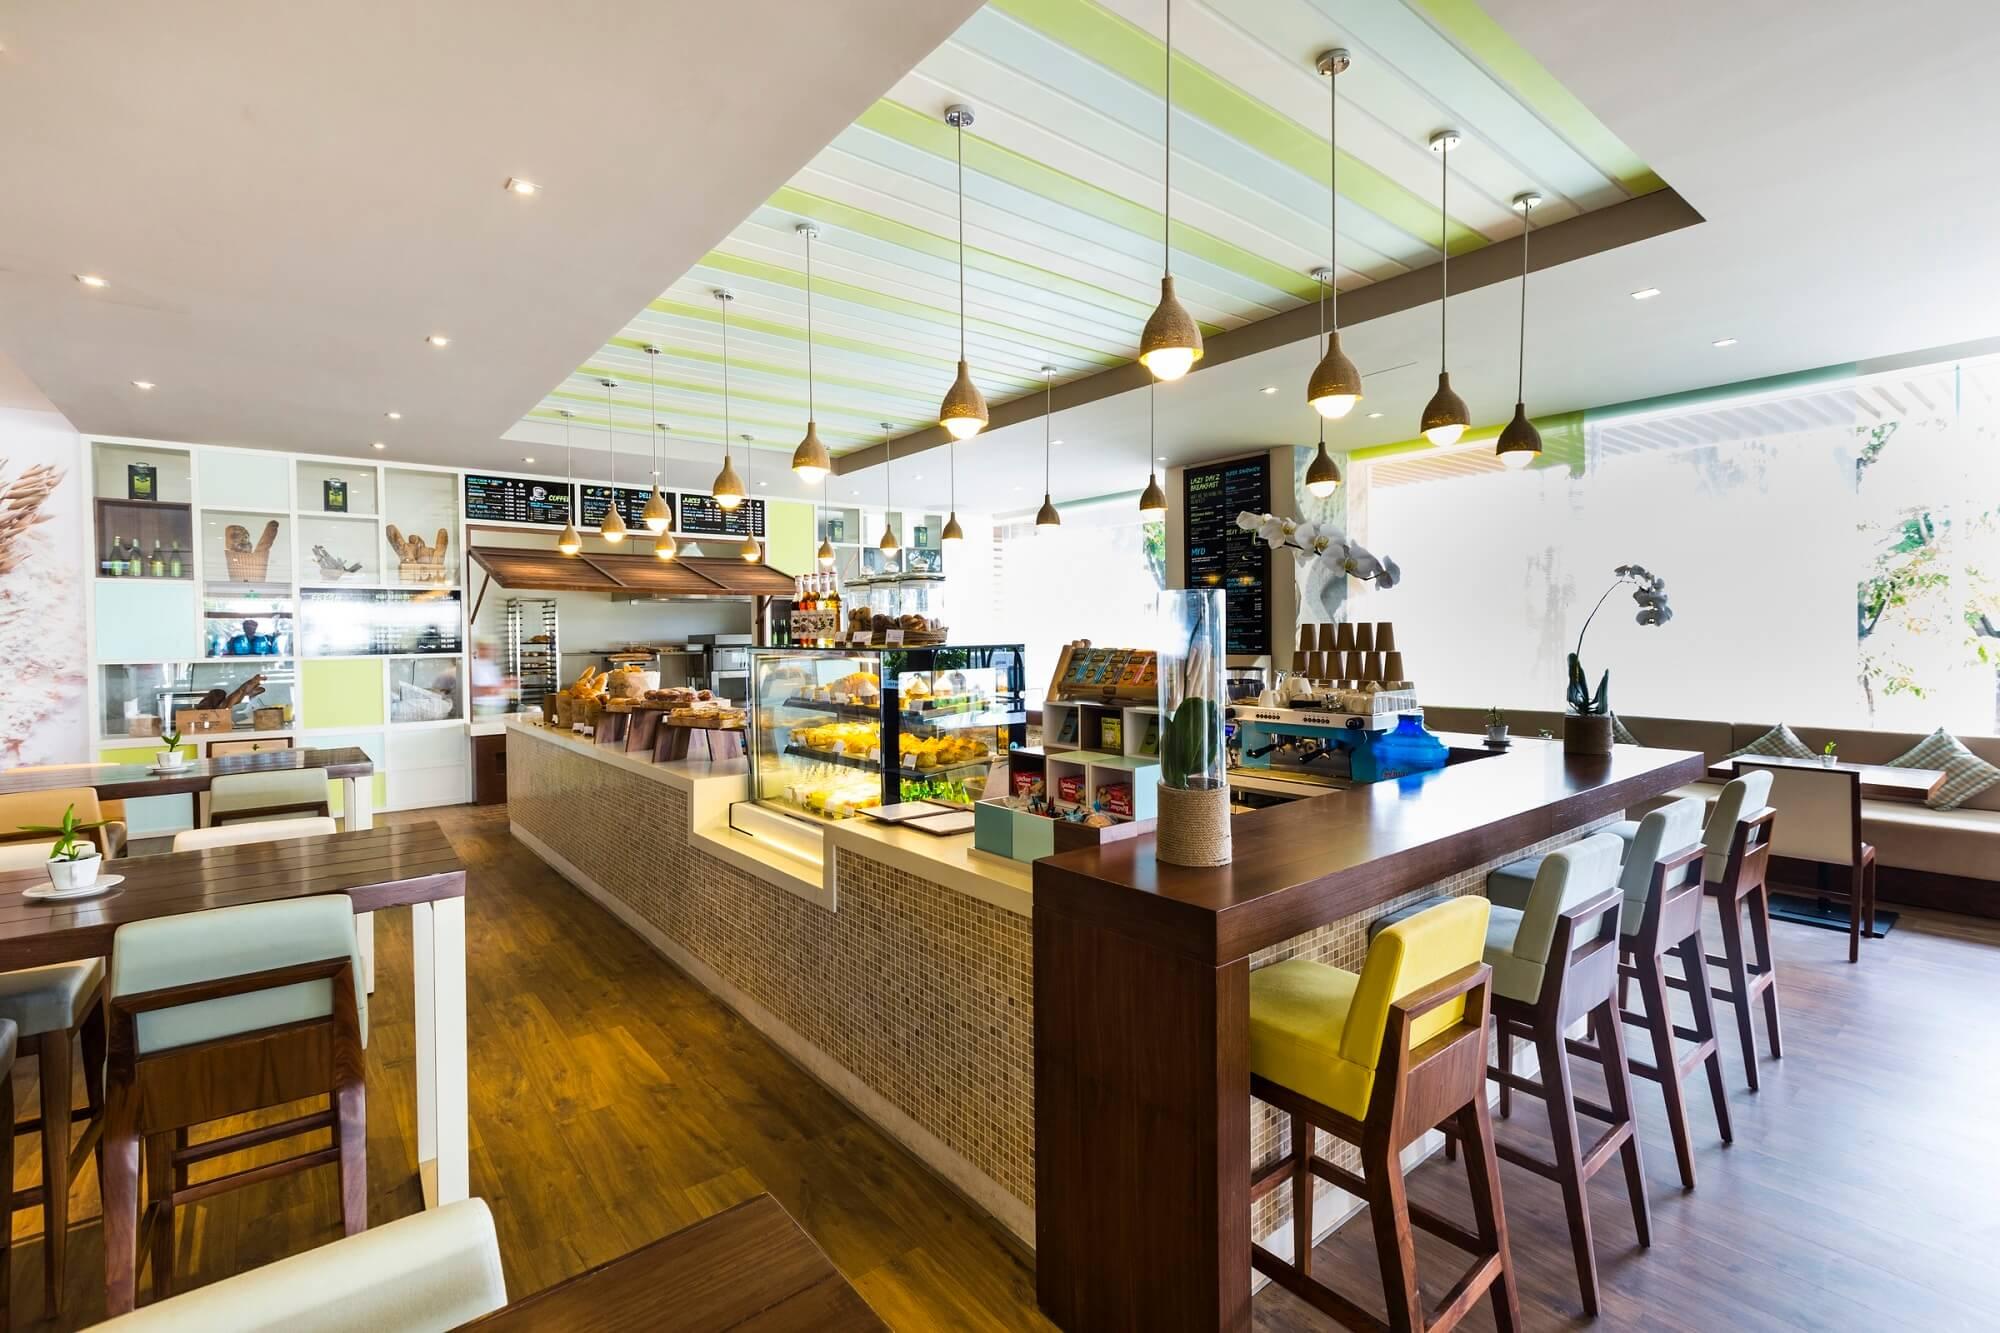 Delicious Cafe Bakery A La Carte Danang Beach Hotel 200 Vo Nguyen Giap Danang Fantasticity Com 02